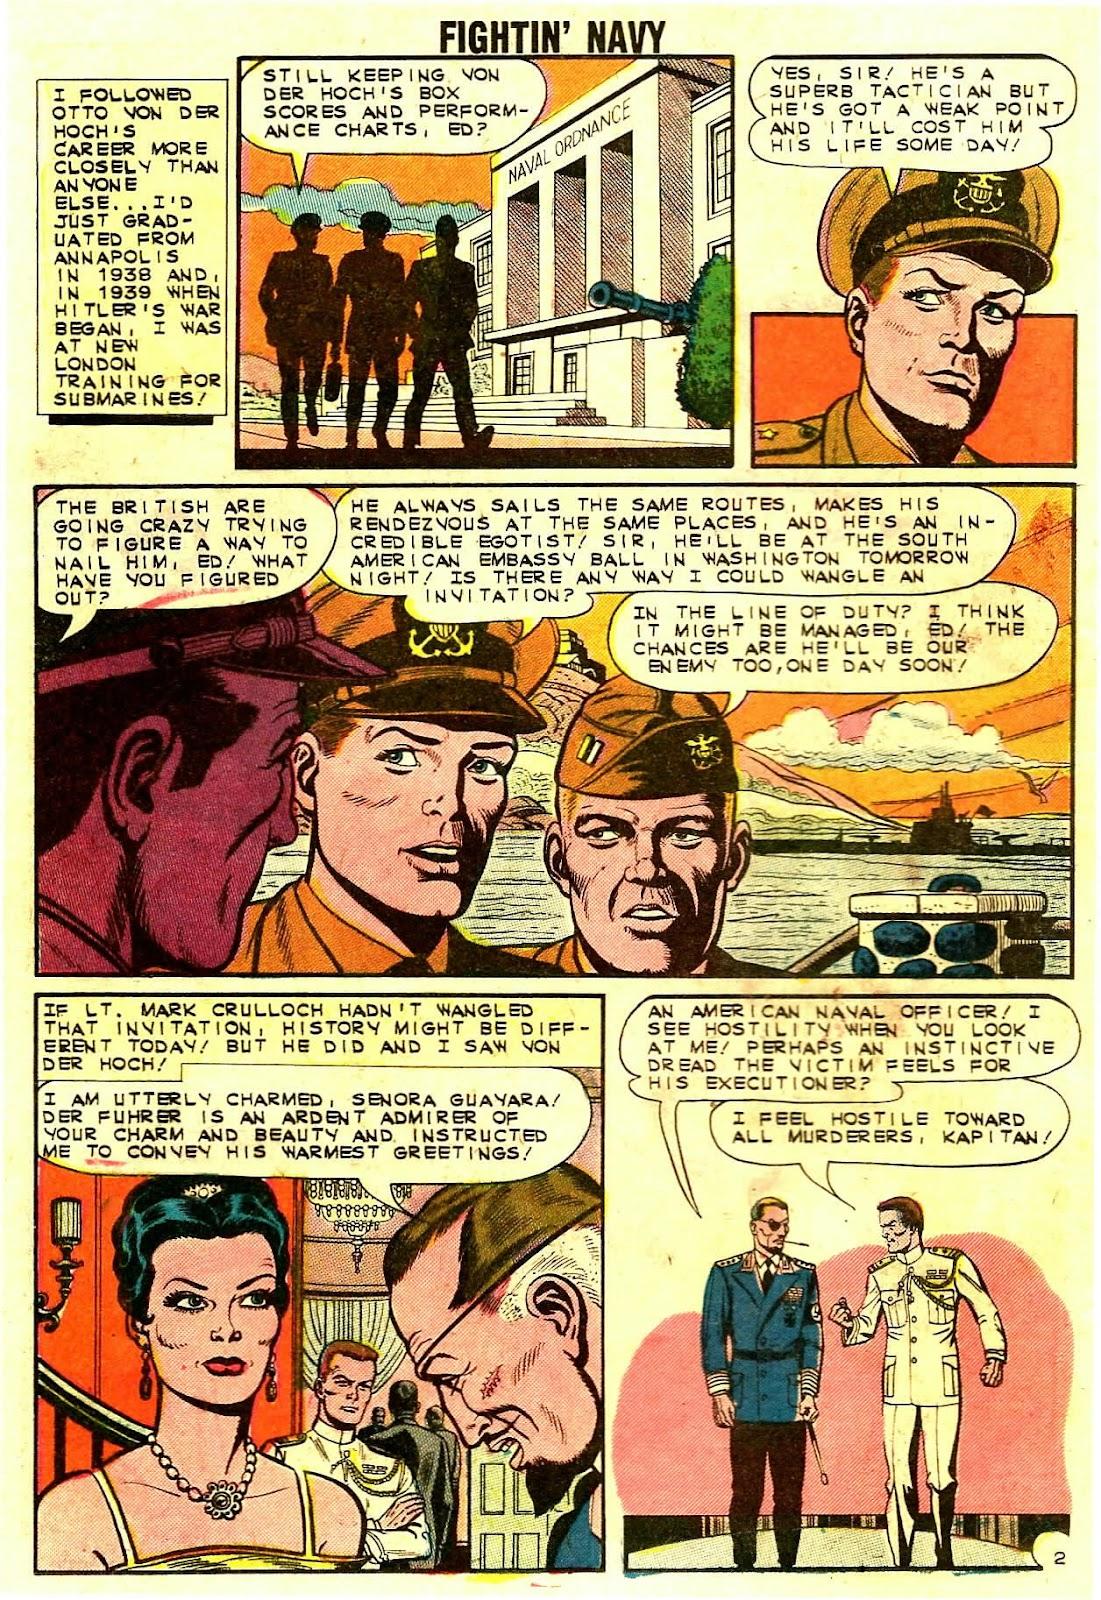 Read online Fightin' Navy comic -  Issue #109 - 24